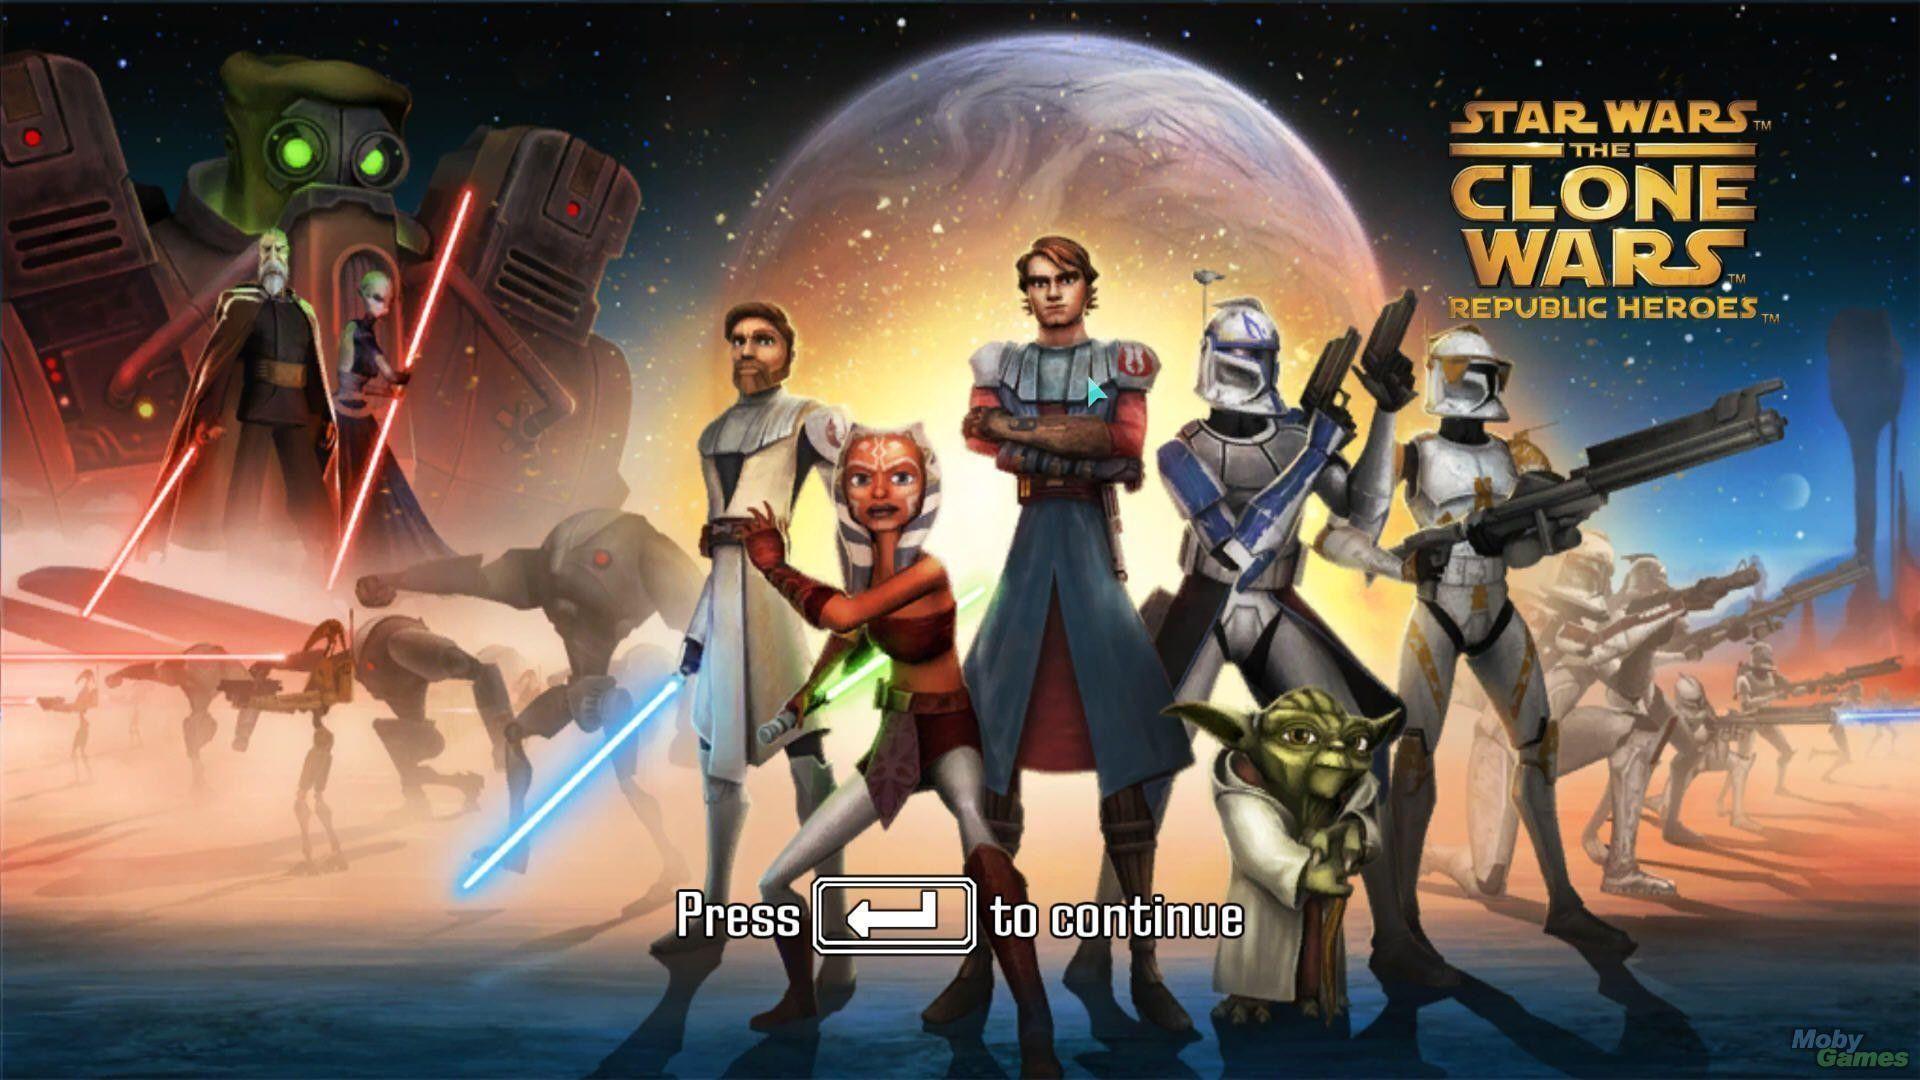 Star Wars The Clone Wars Season 7 Wallpaper Google Search Clone Wars Star Wars Clone Wars Star Wars